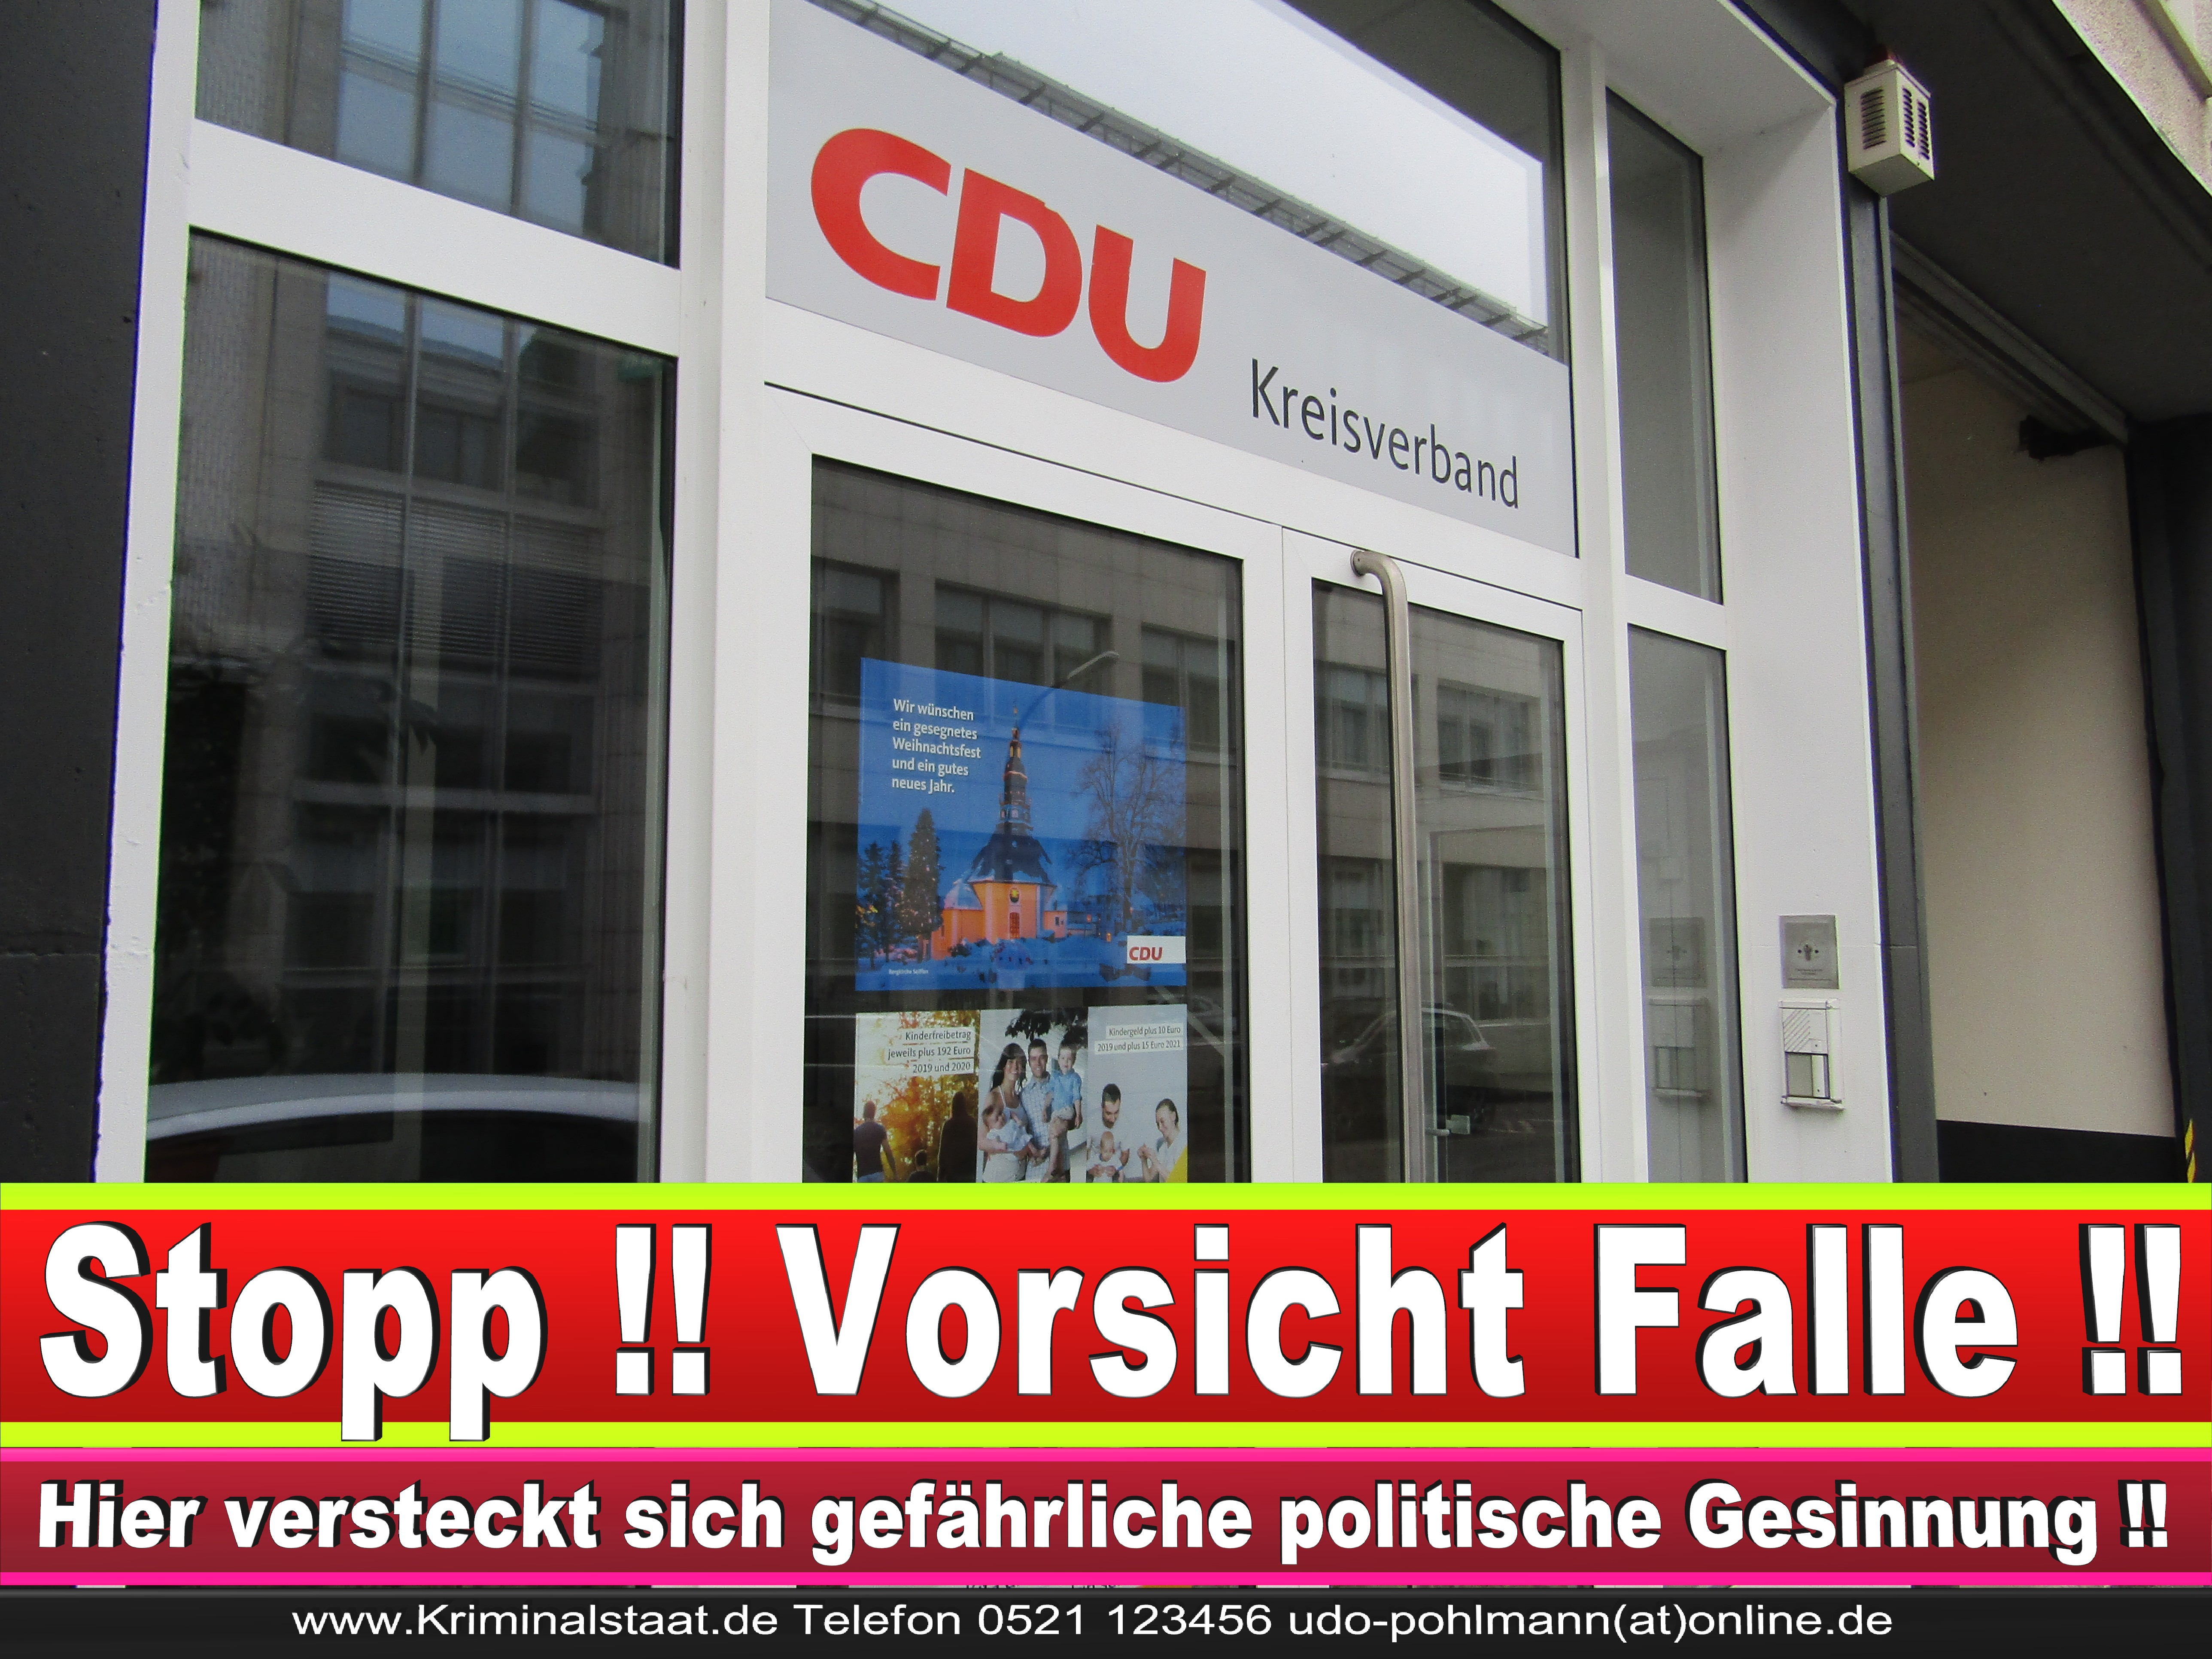 CDU DORTMUND KREISVERBAND BüRGERBüRO CDU FRAKTION ORTSVERBAND CDU NRW GESCHäFTSSTELLE ADRESSE RATSMITGLIEDER CDU (13) 1